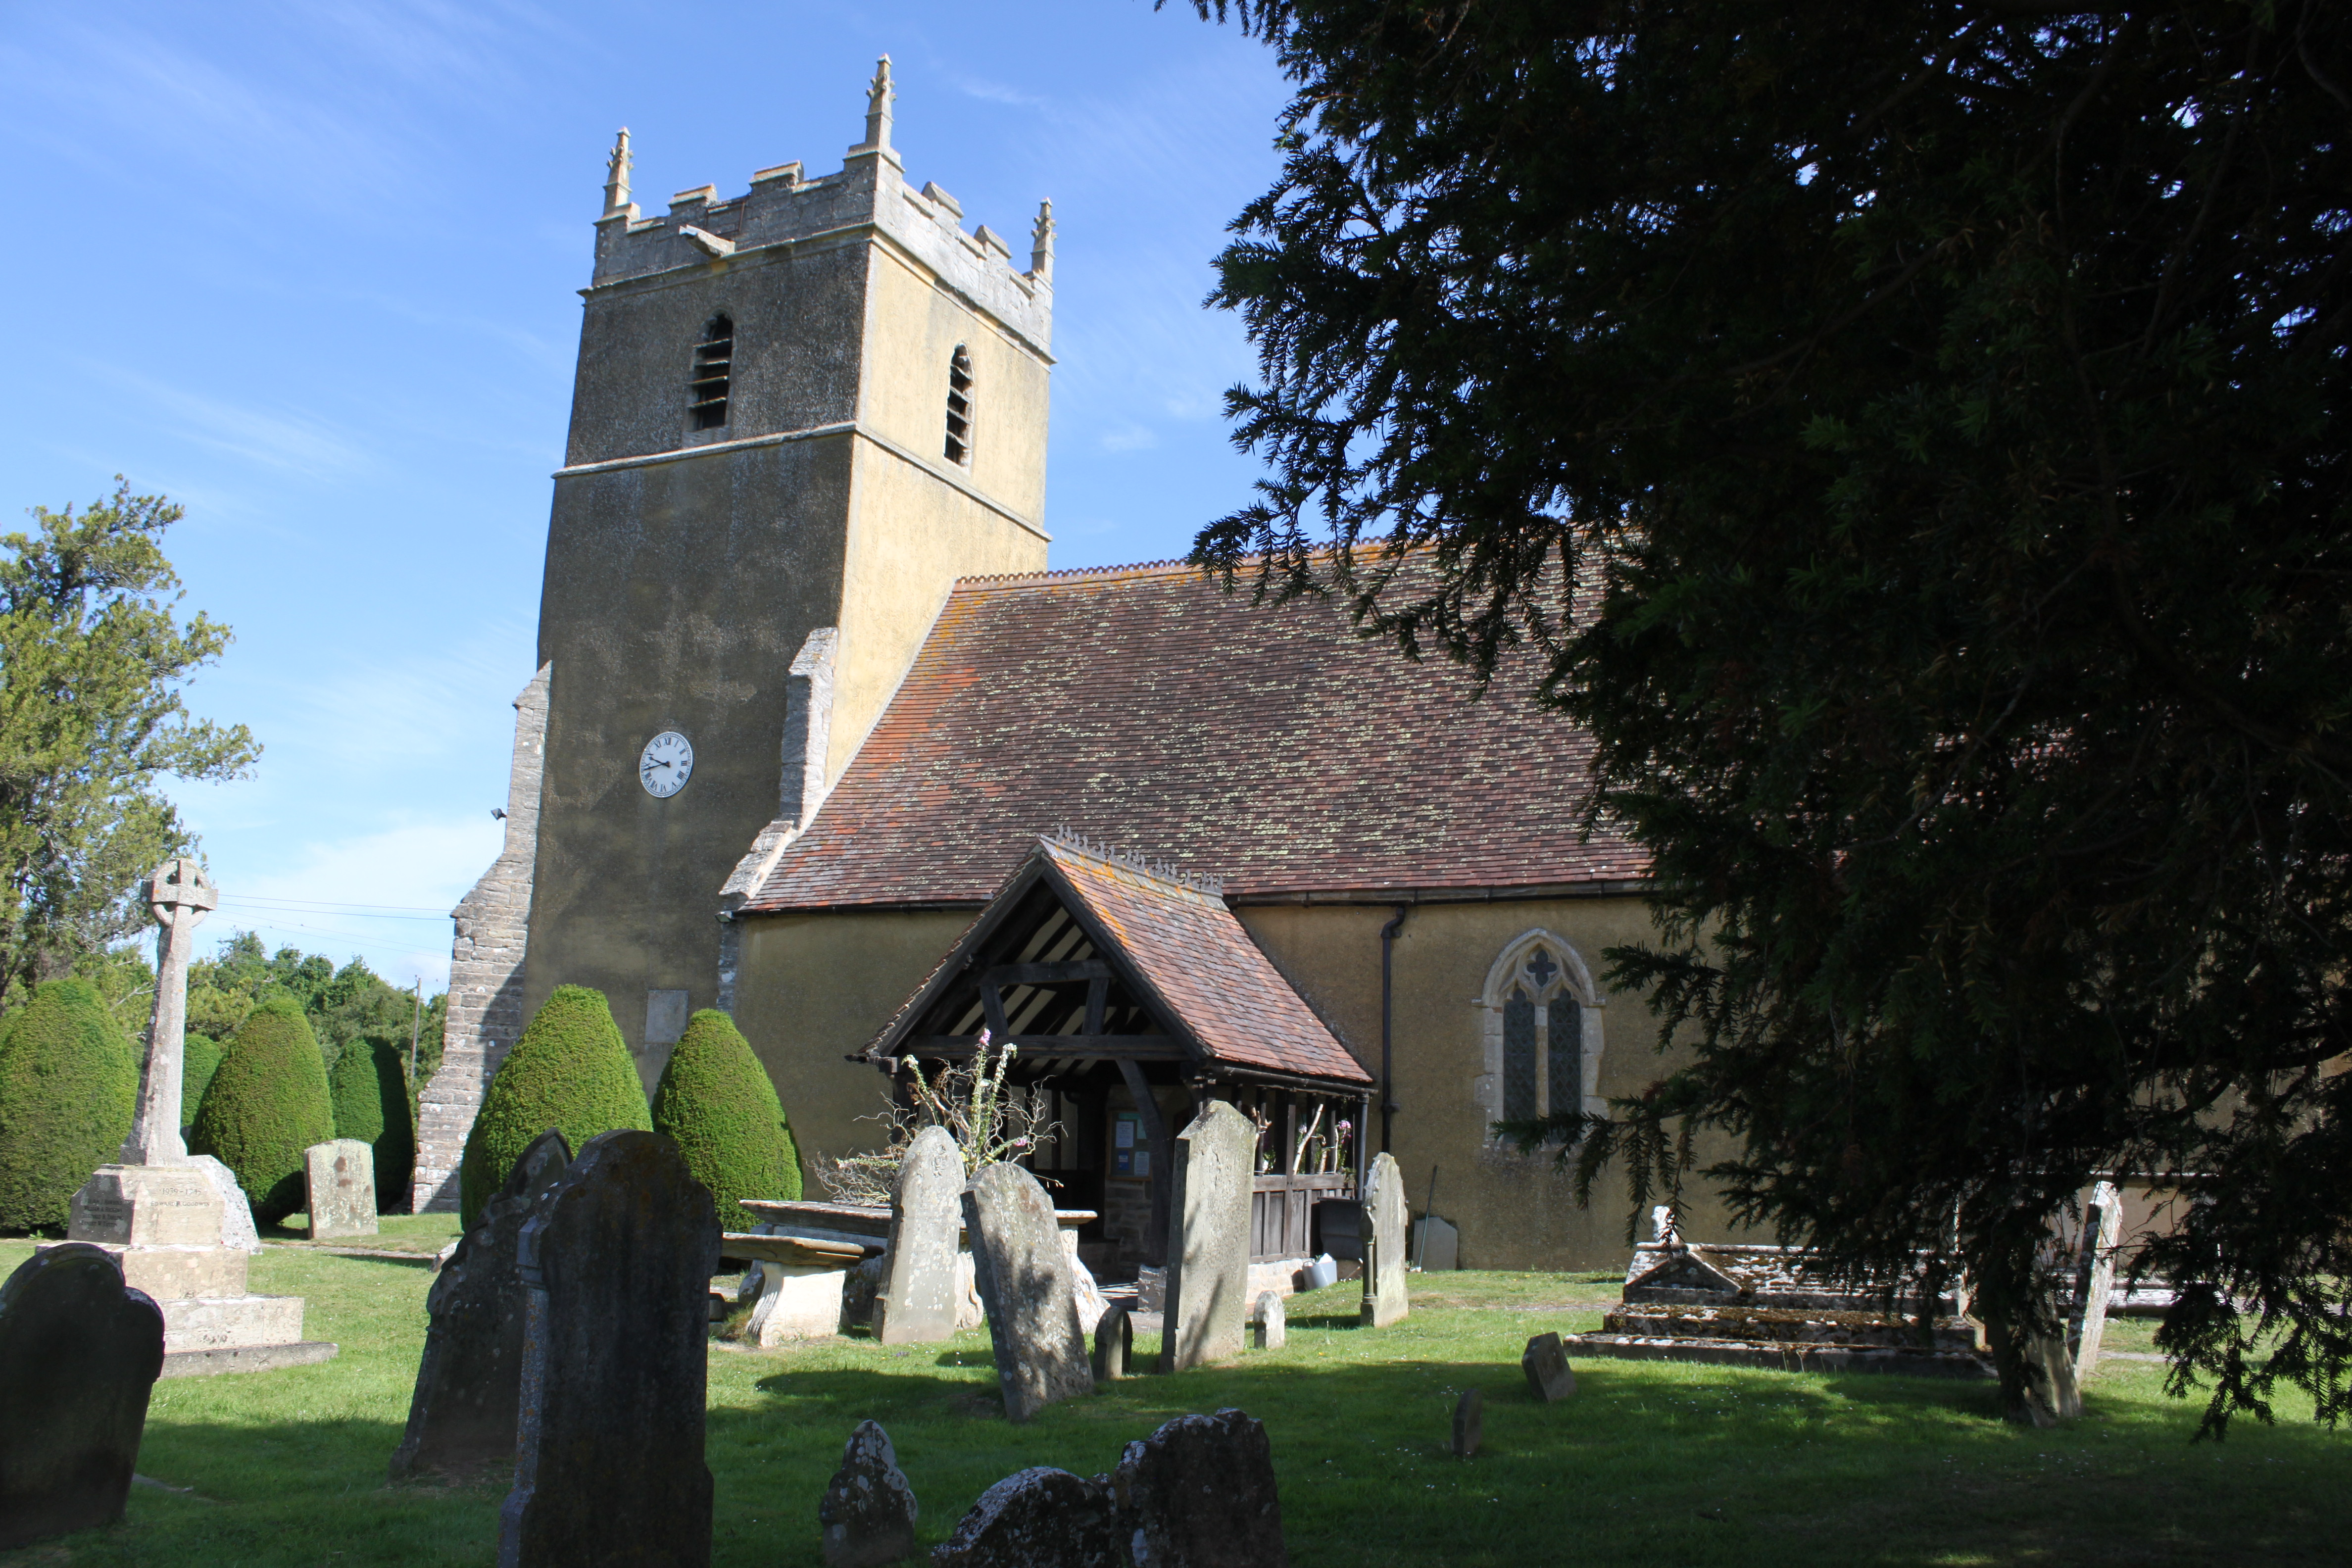 Tirley Church